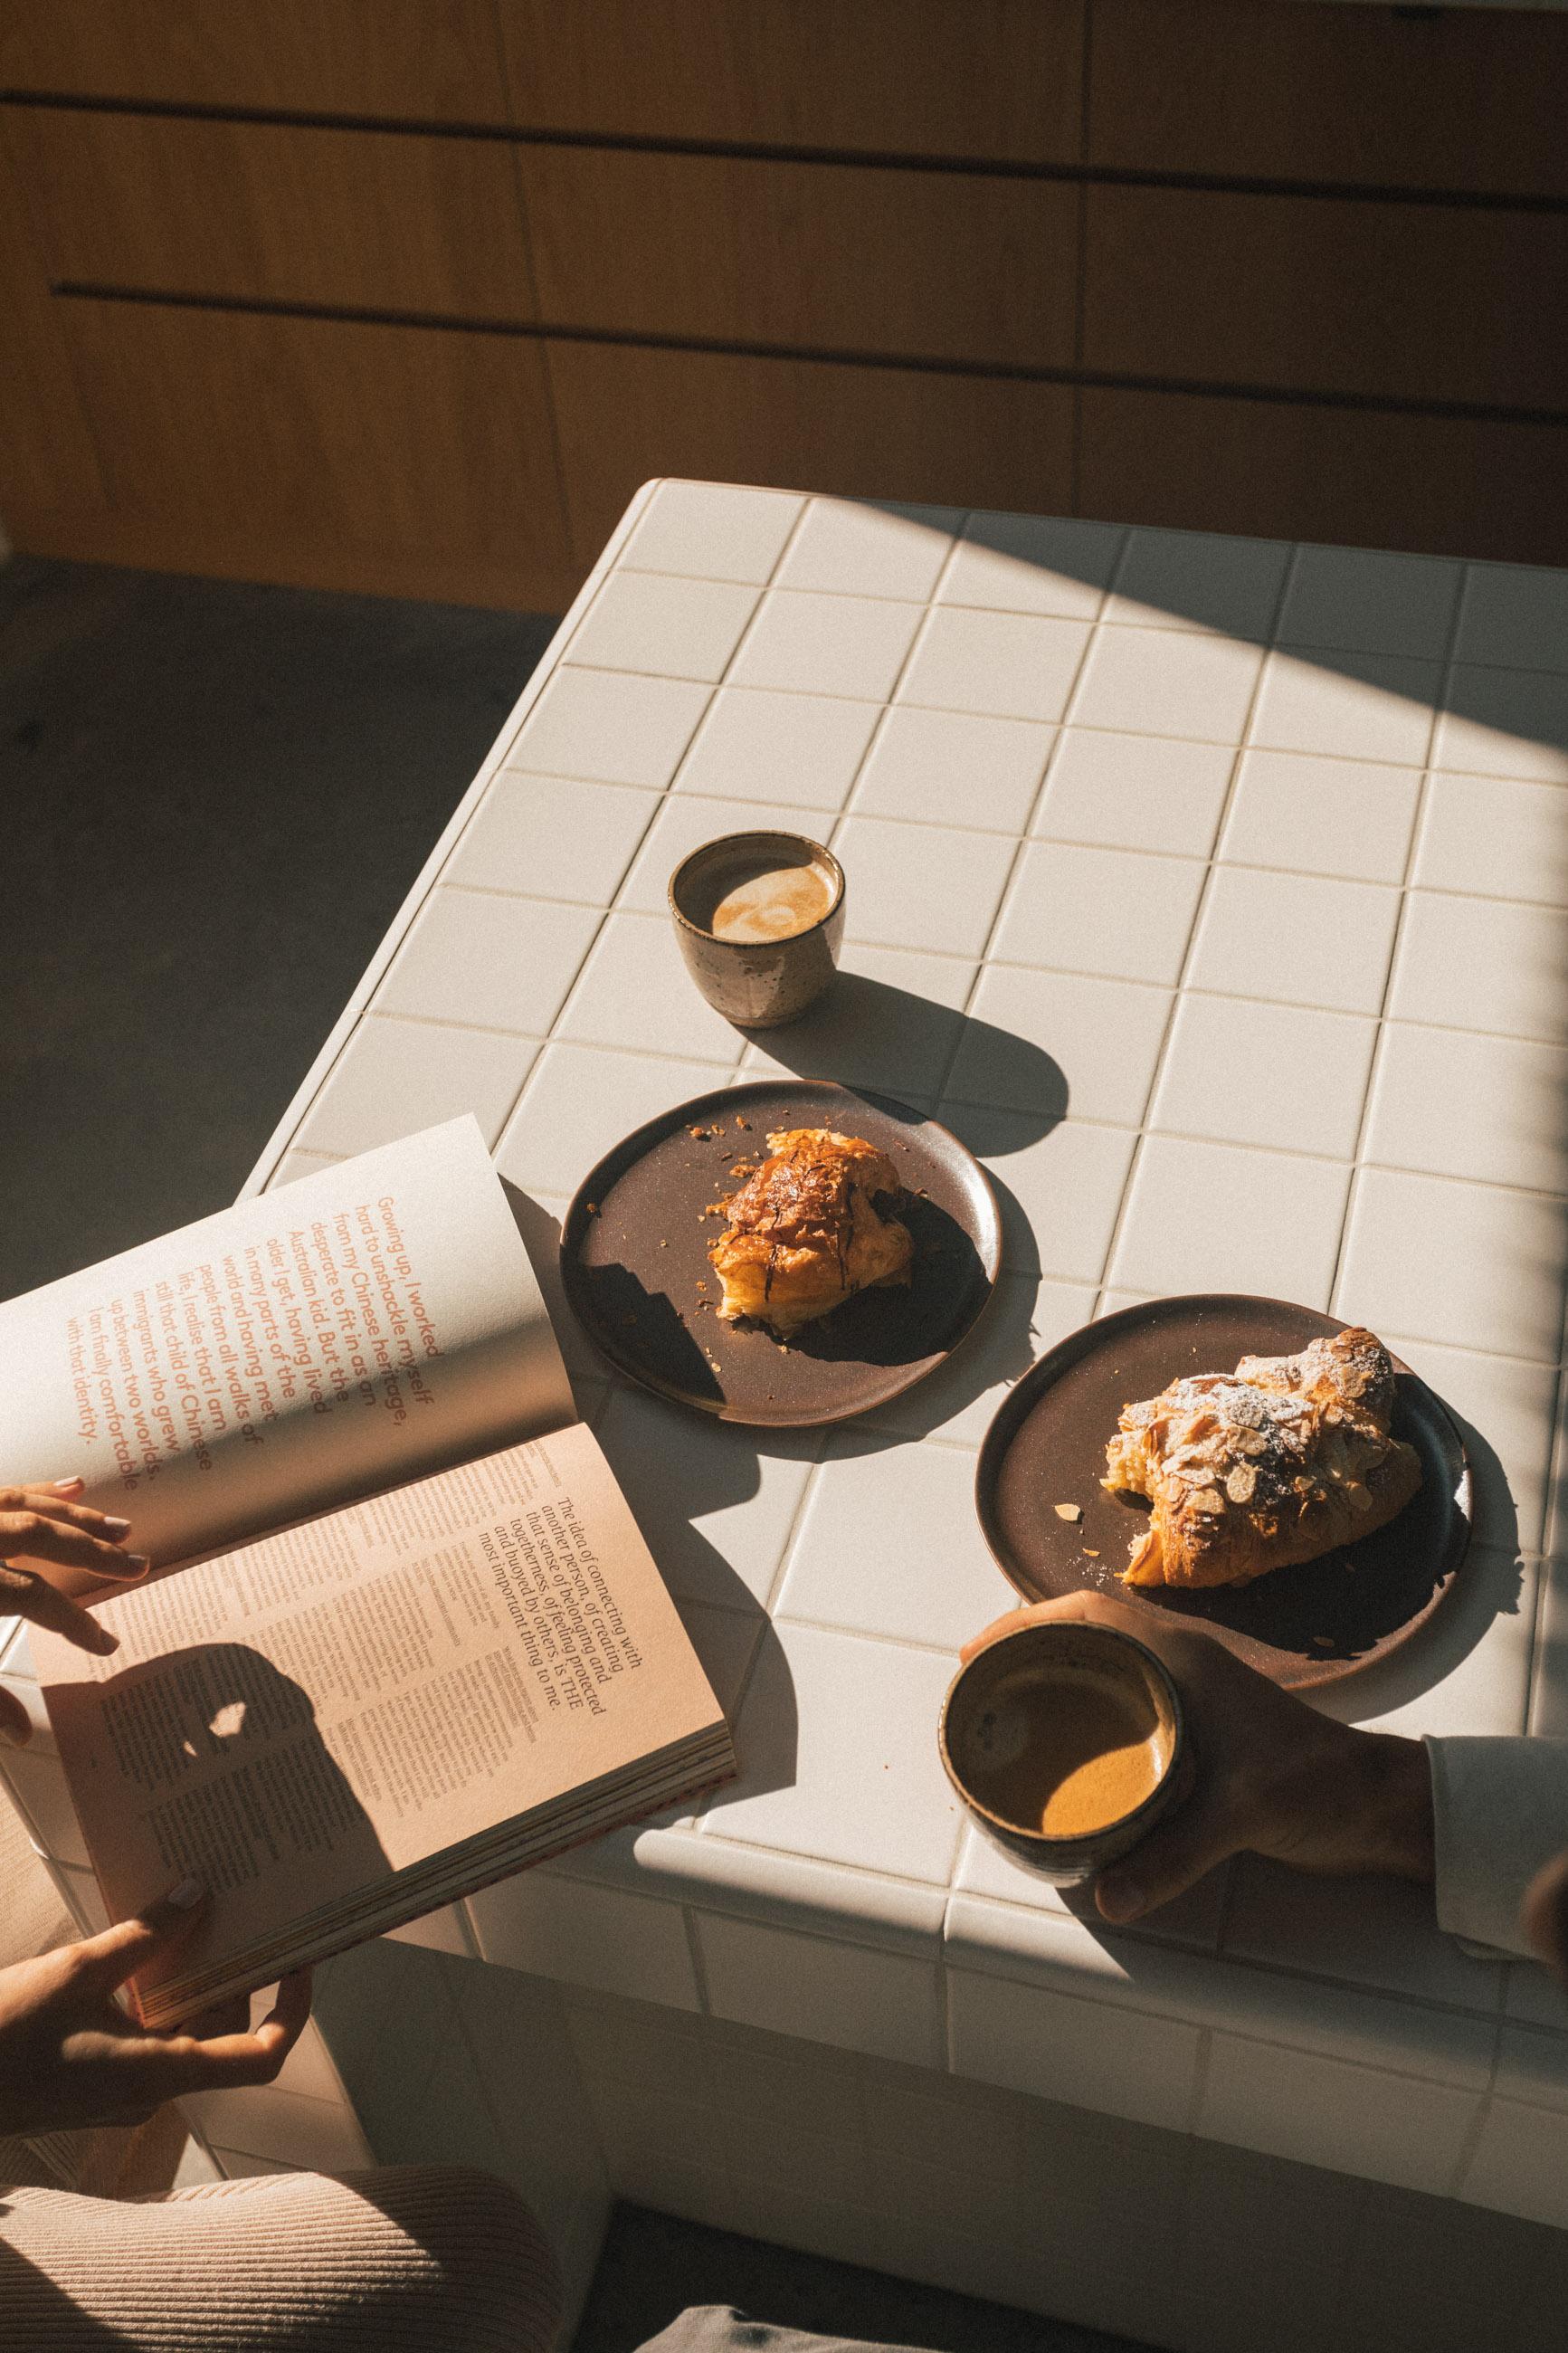 Allpress Capsule Coffee with breakfast